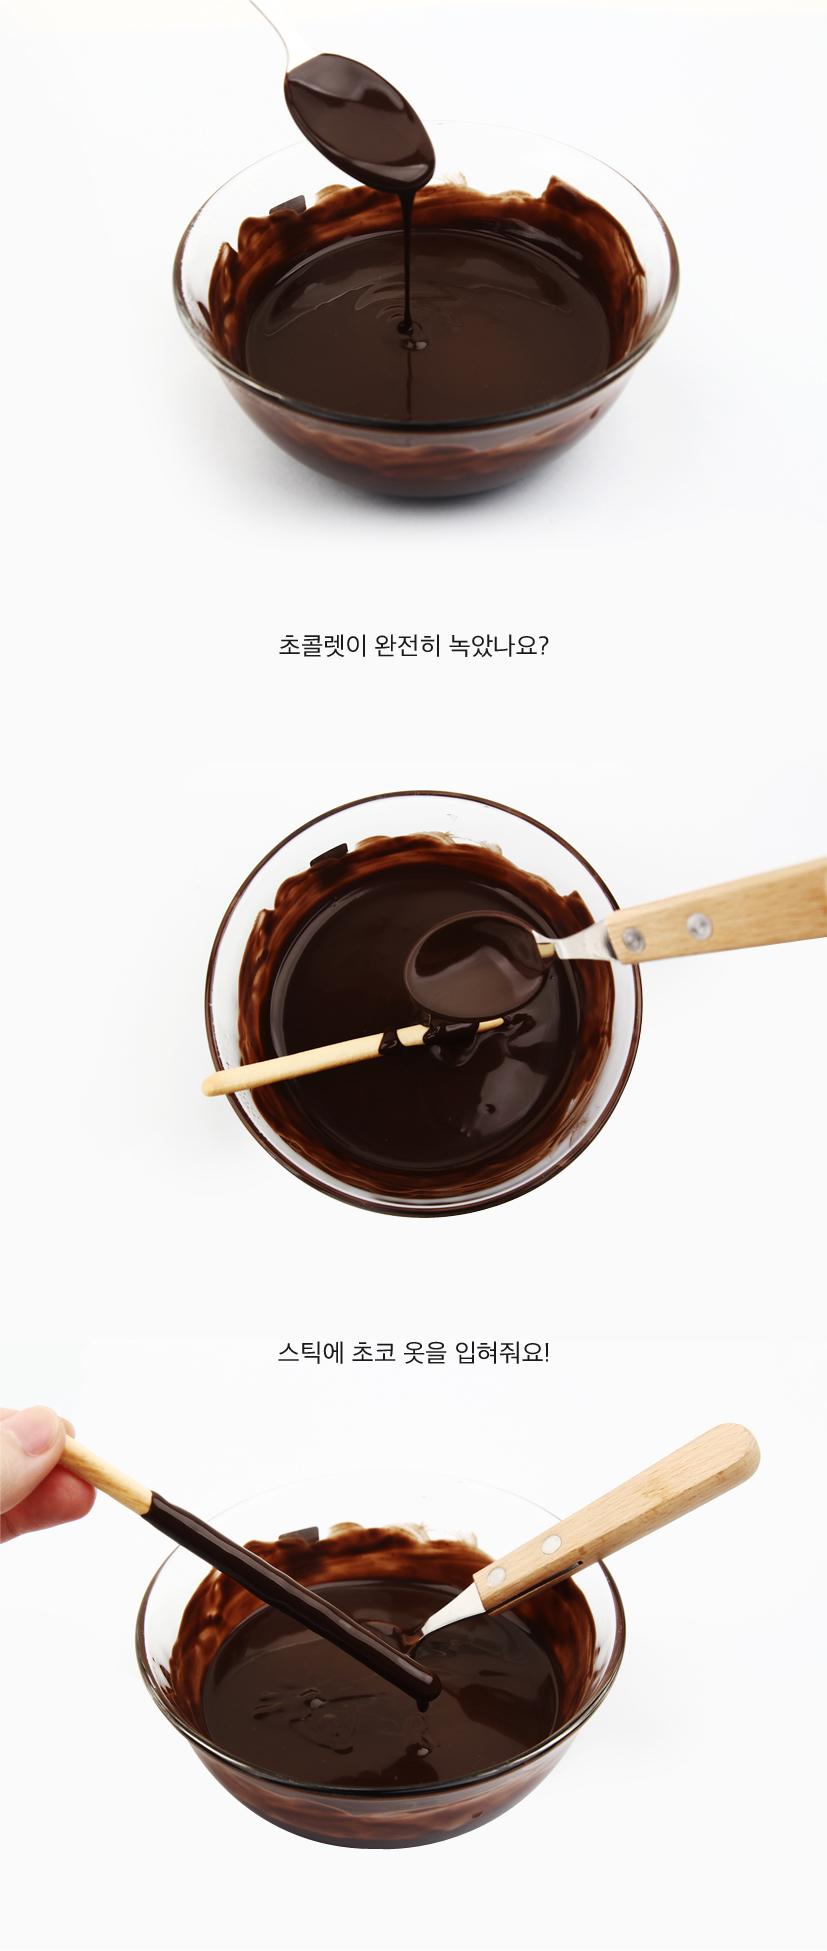 �ٺ����  babosarang ���÷����� 12ź simple recipe ������ ������ �ƴ�ī ������� ����� ���ݷ��� ������ ��ҳ���?  ��ƽ�� ���� ���� �������!